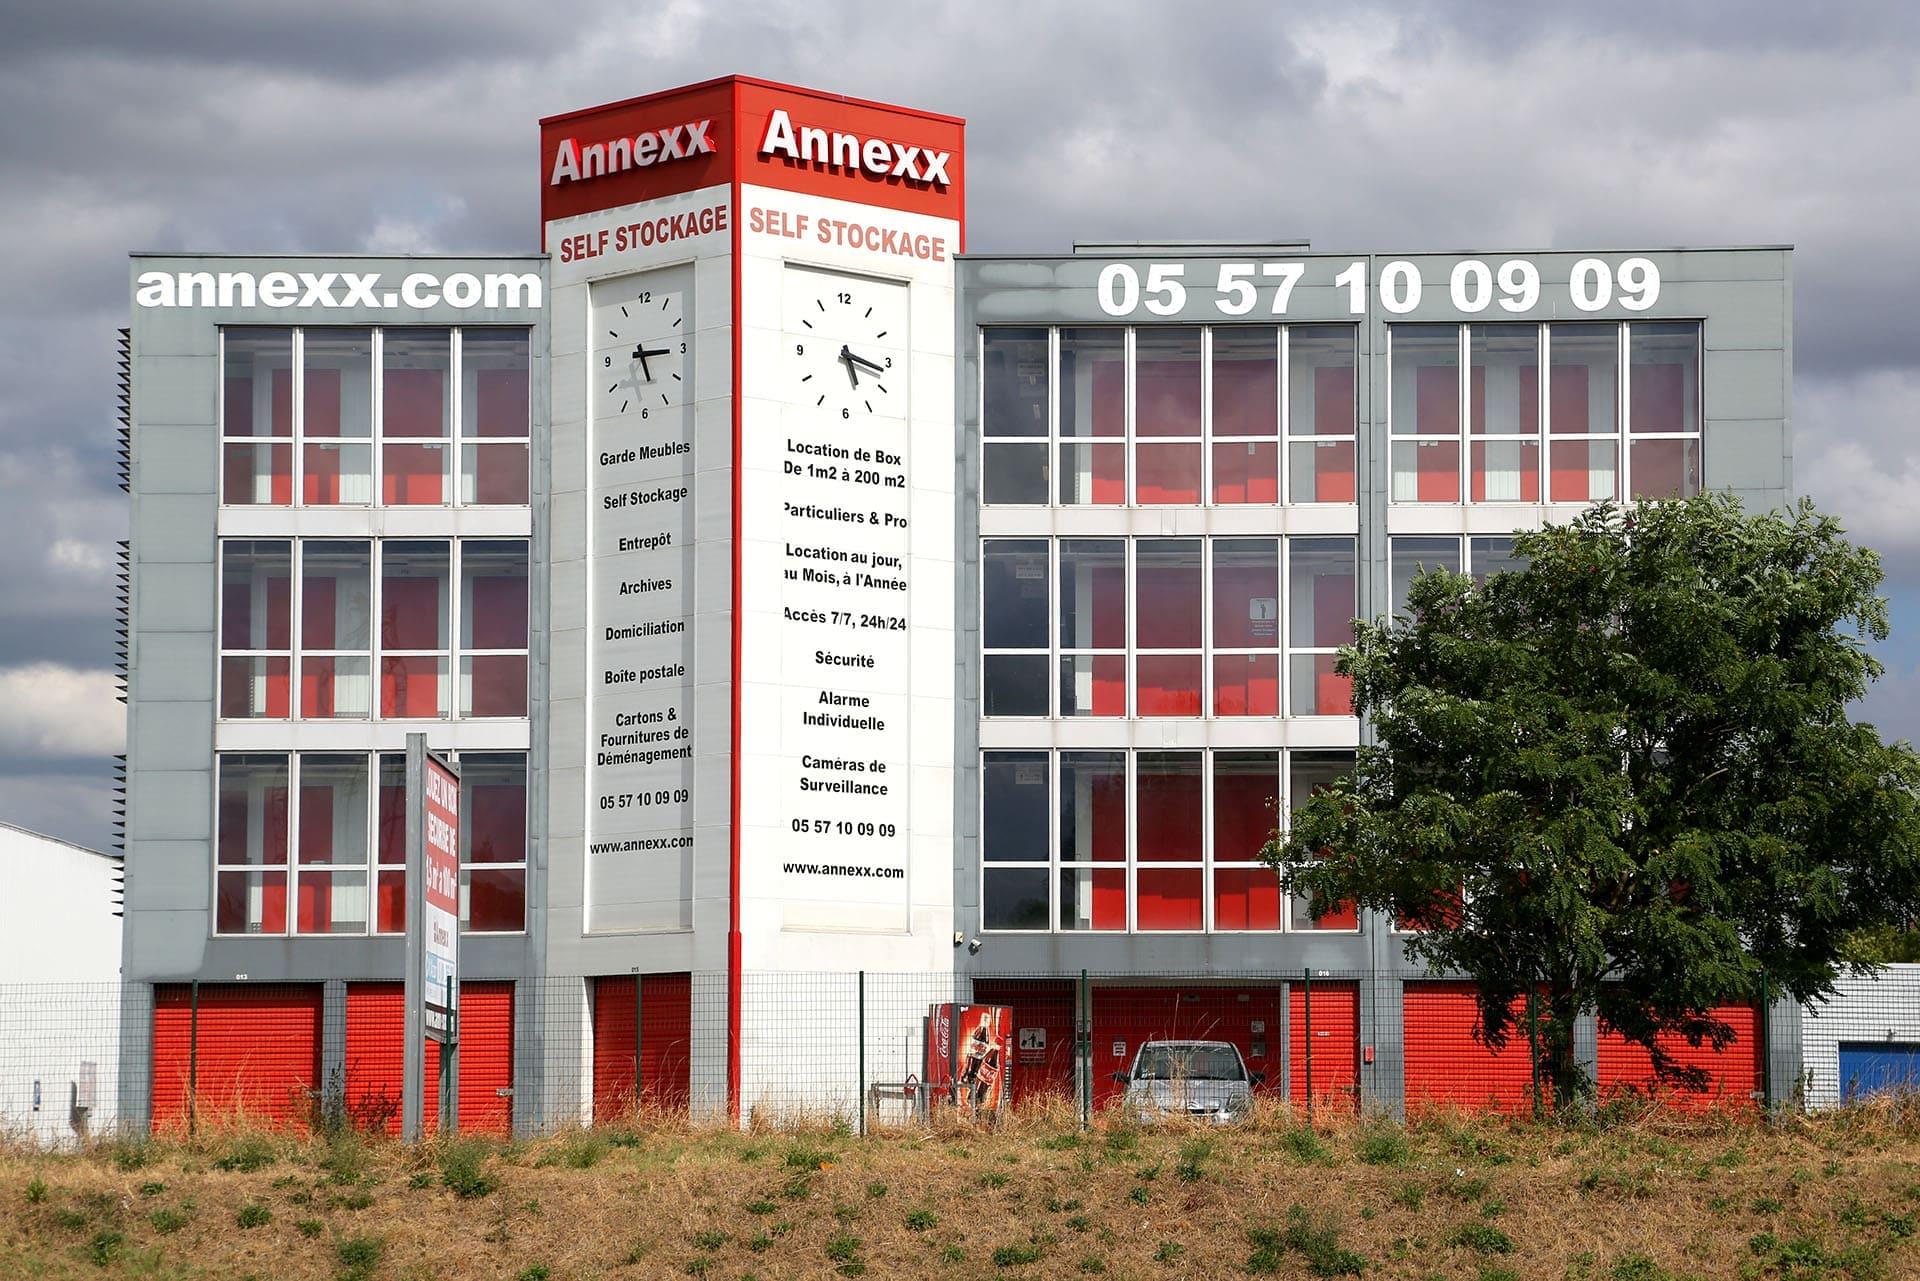 Location de box garde meuble lac annexx for Garde meuble bordeaux